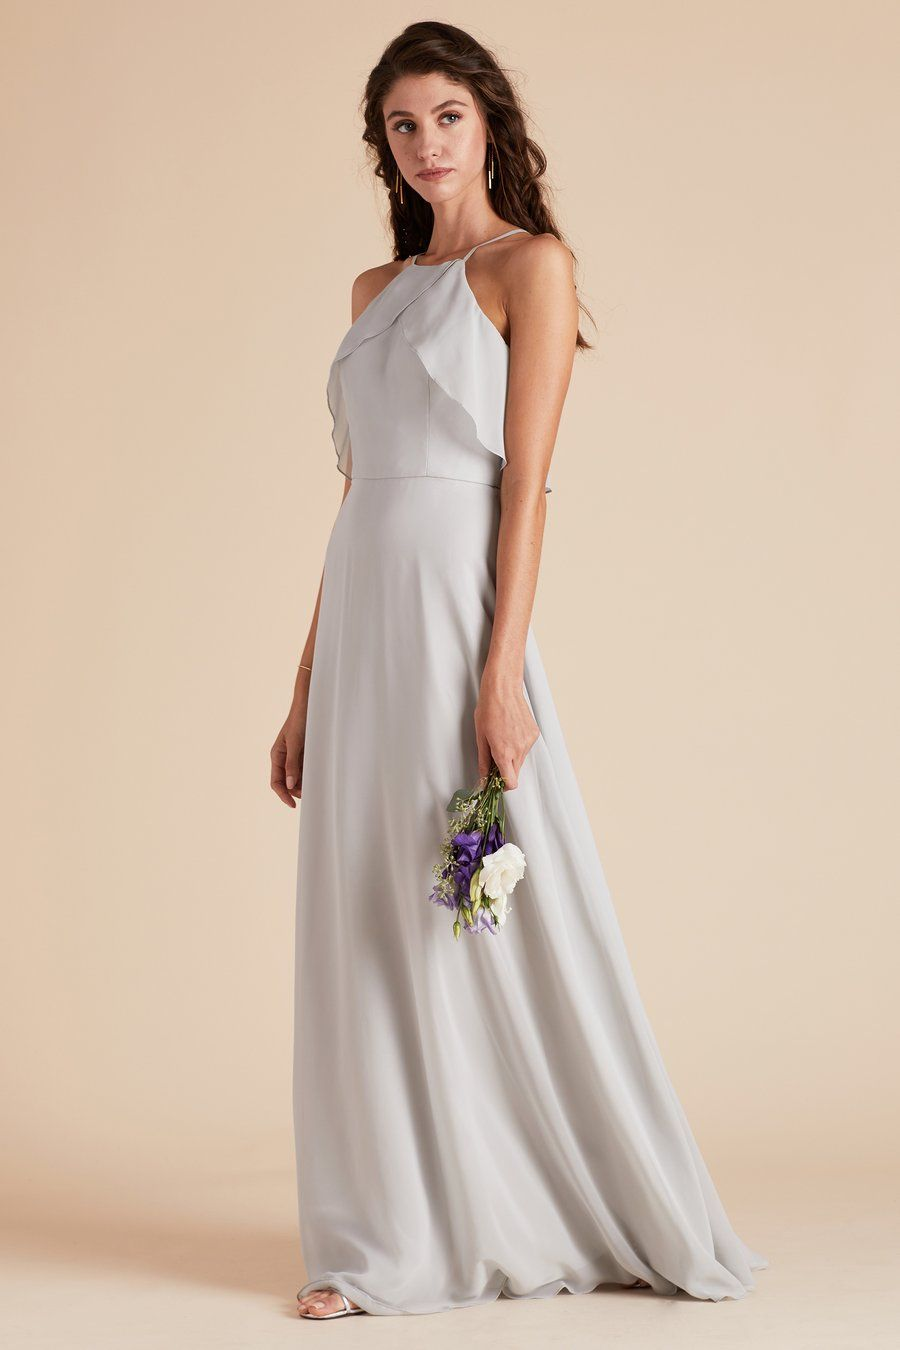 Dove Gray Halter Bridesmaid Dress Under 100